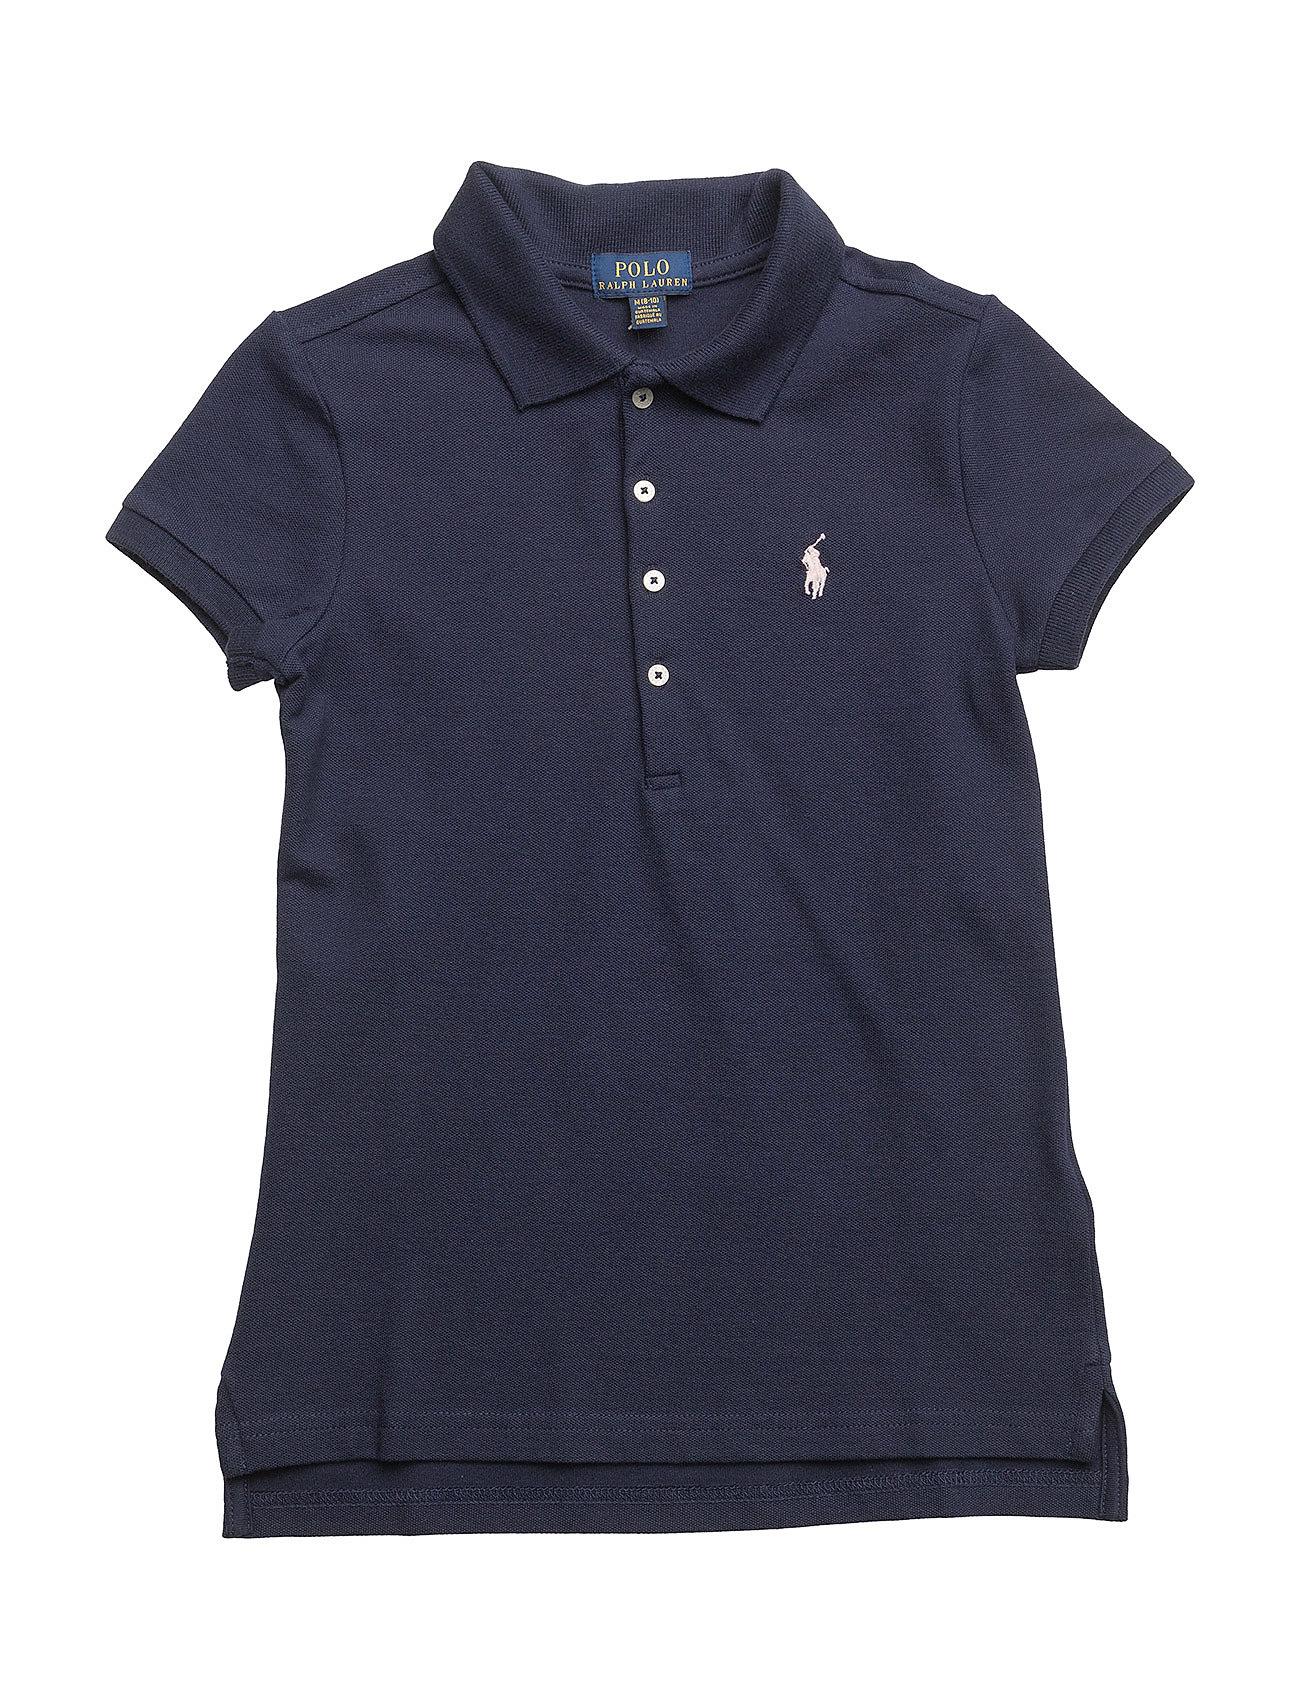 Ralph Lauren Kids Cotton Polo Shirt - FRENCH NAVY